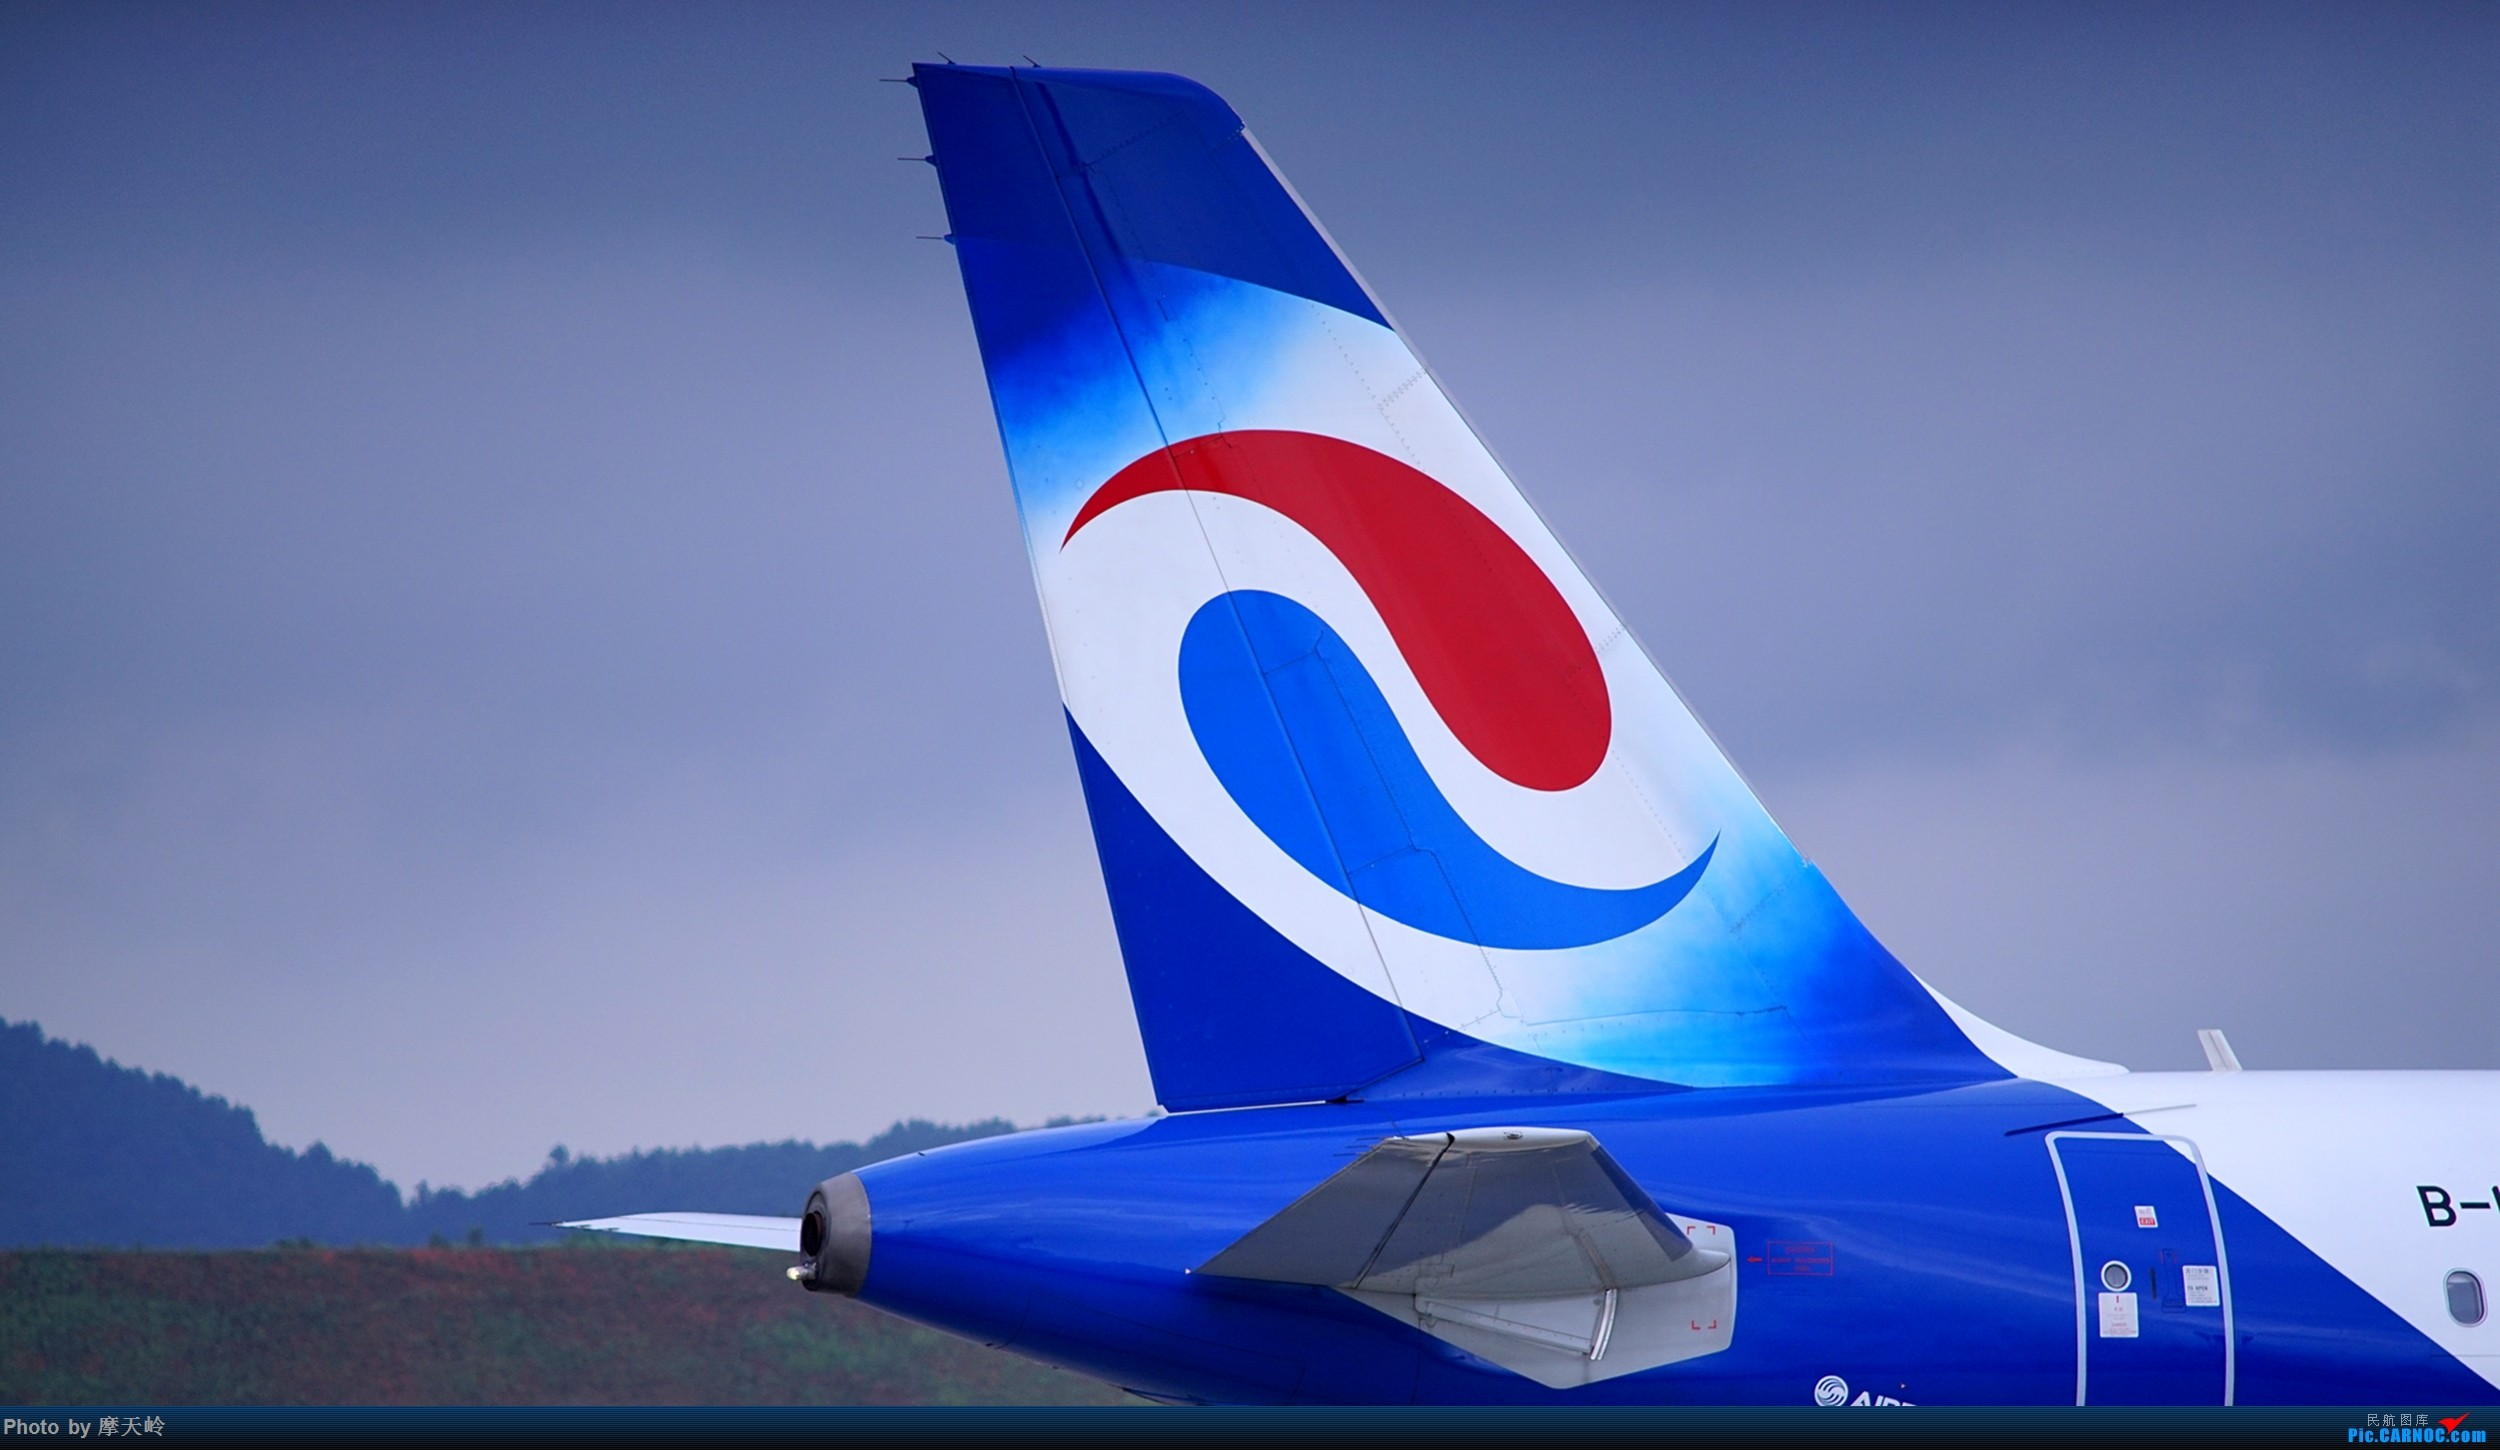 Re:[原创]kmg 东西跑道追拍飞机 AIRBUS A320-200 B-1827 中国昆明长水国际机场